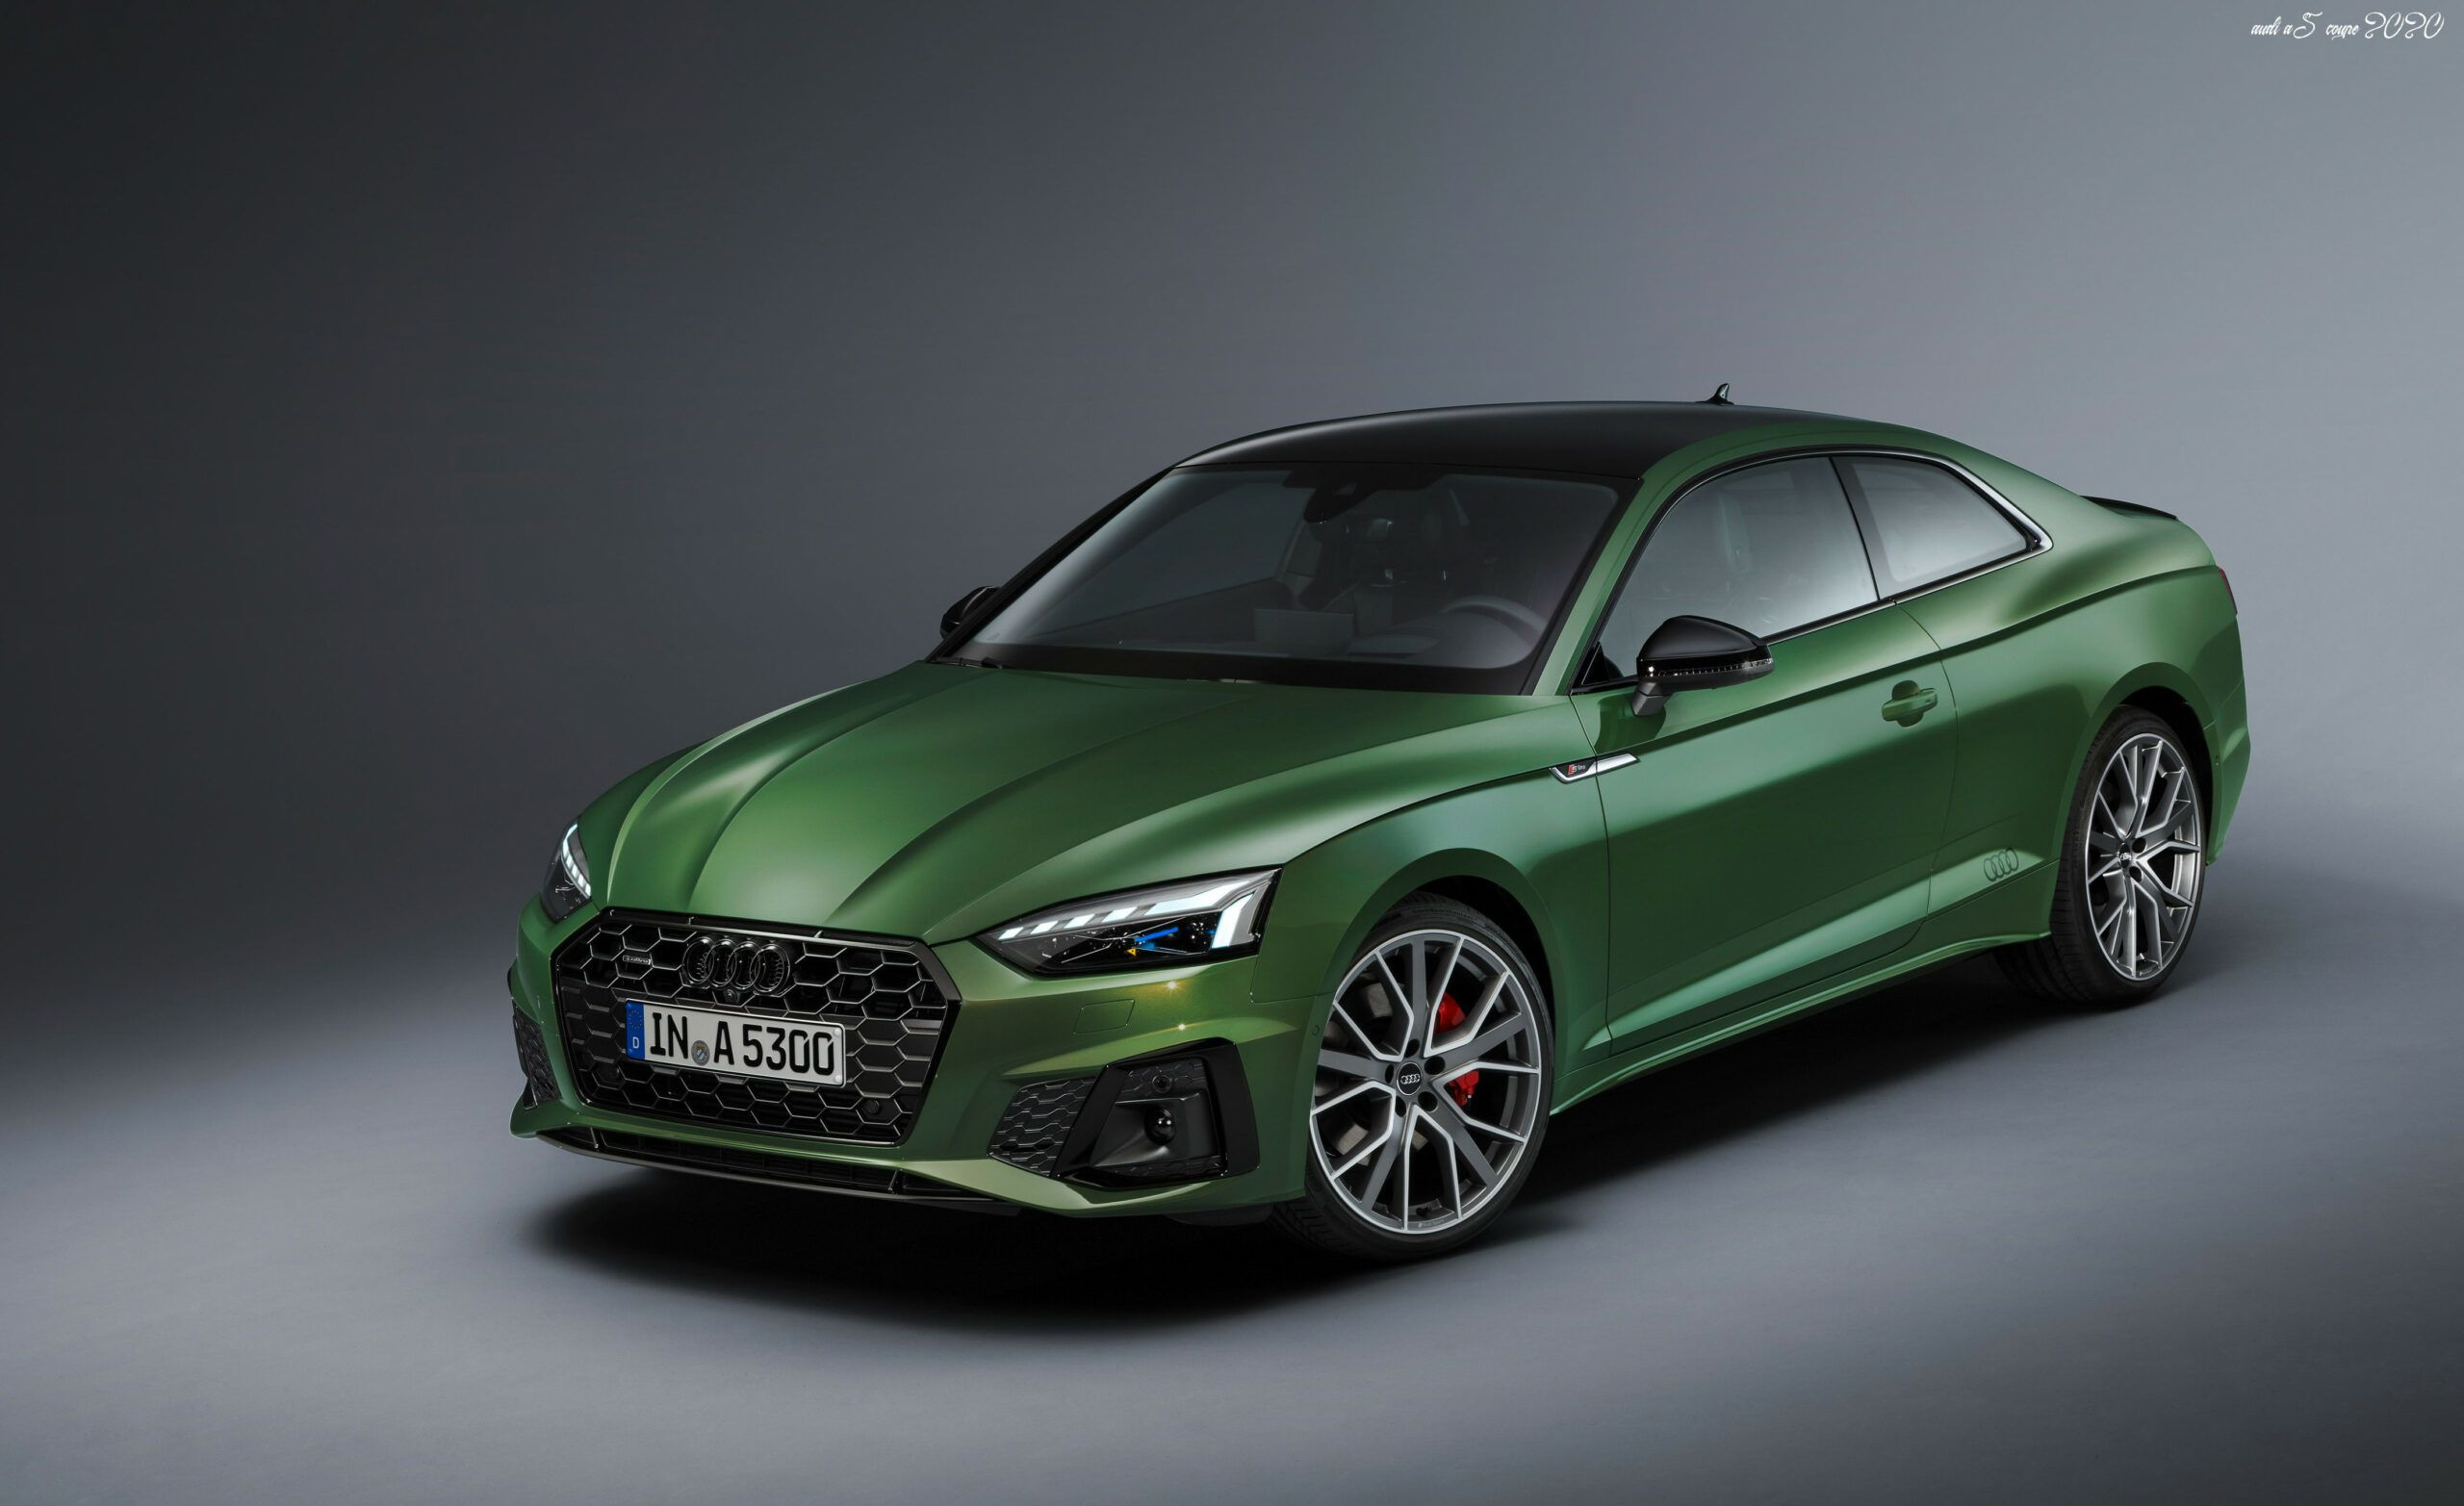 Audi A5 Coupe 2020 In 2020 Audi S5 Audi A5 Coupe Audi A5